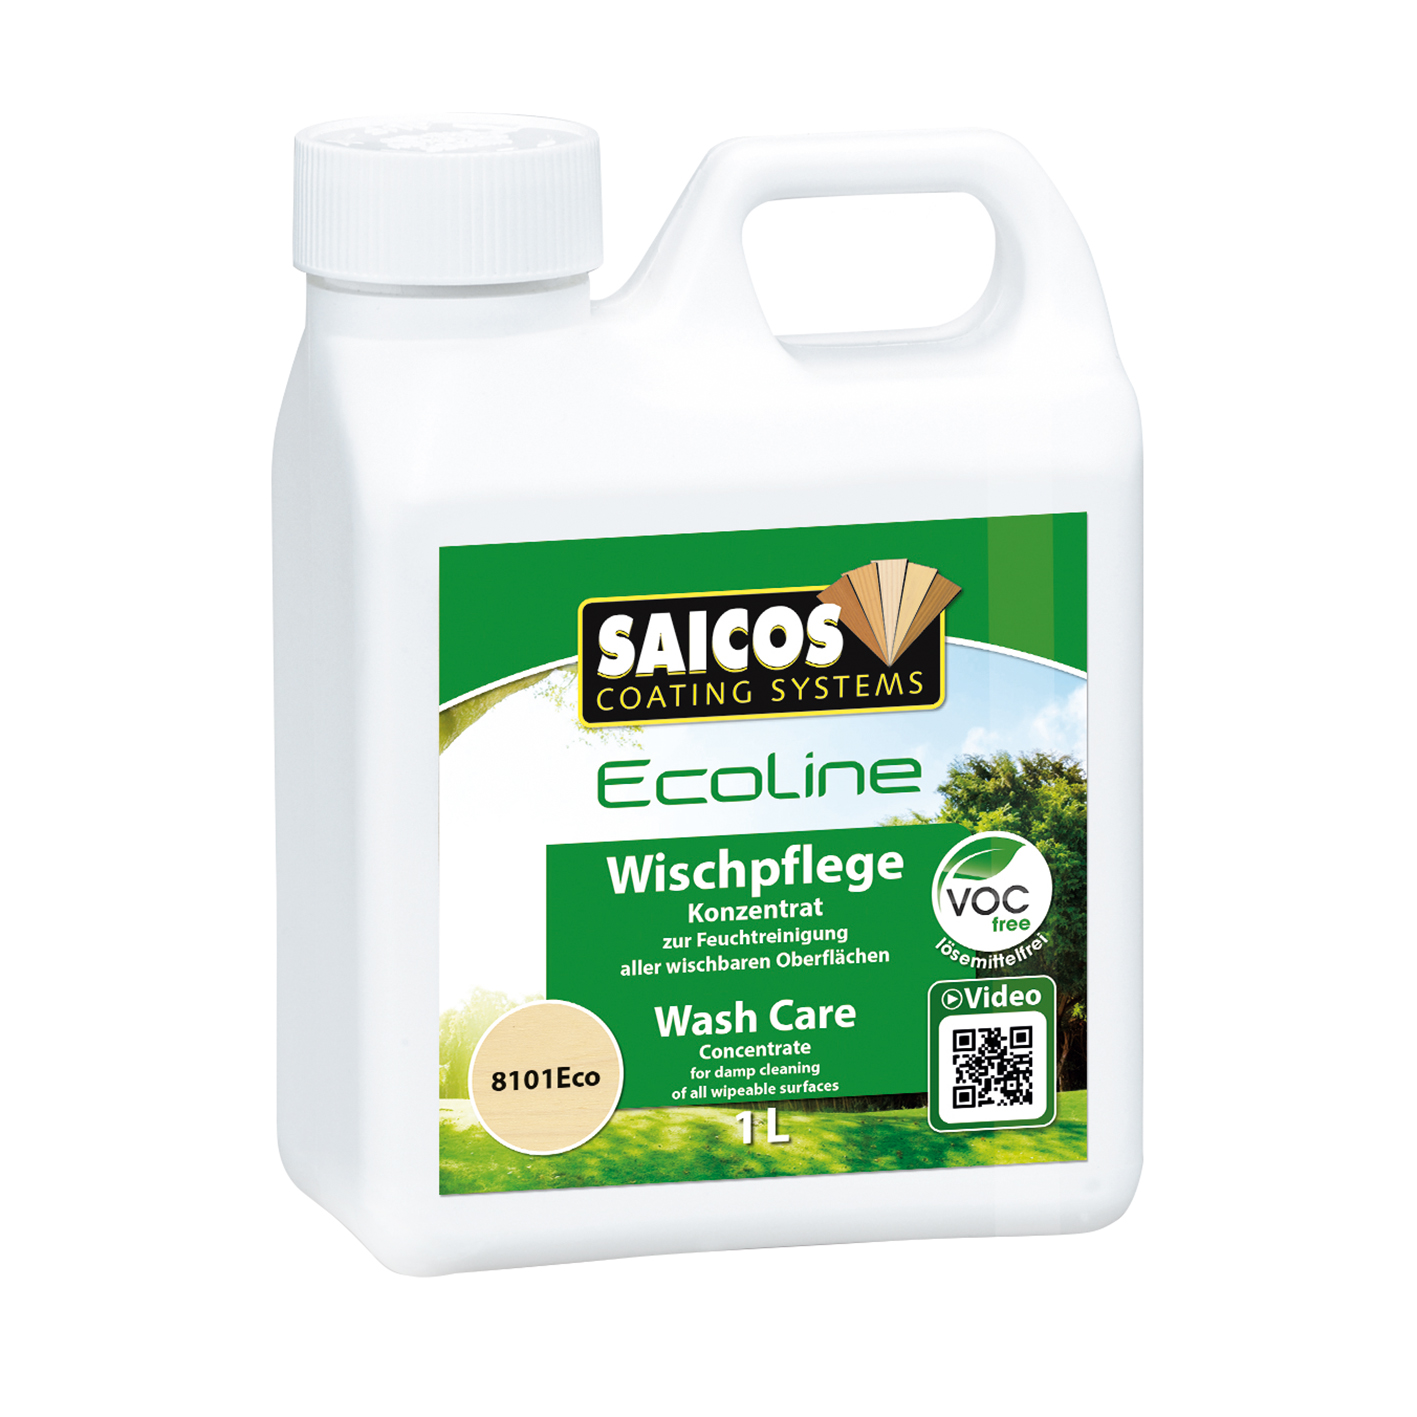 SAICOS Ecoline wip care 1L